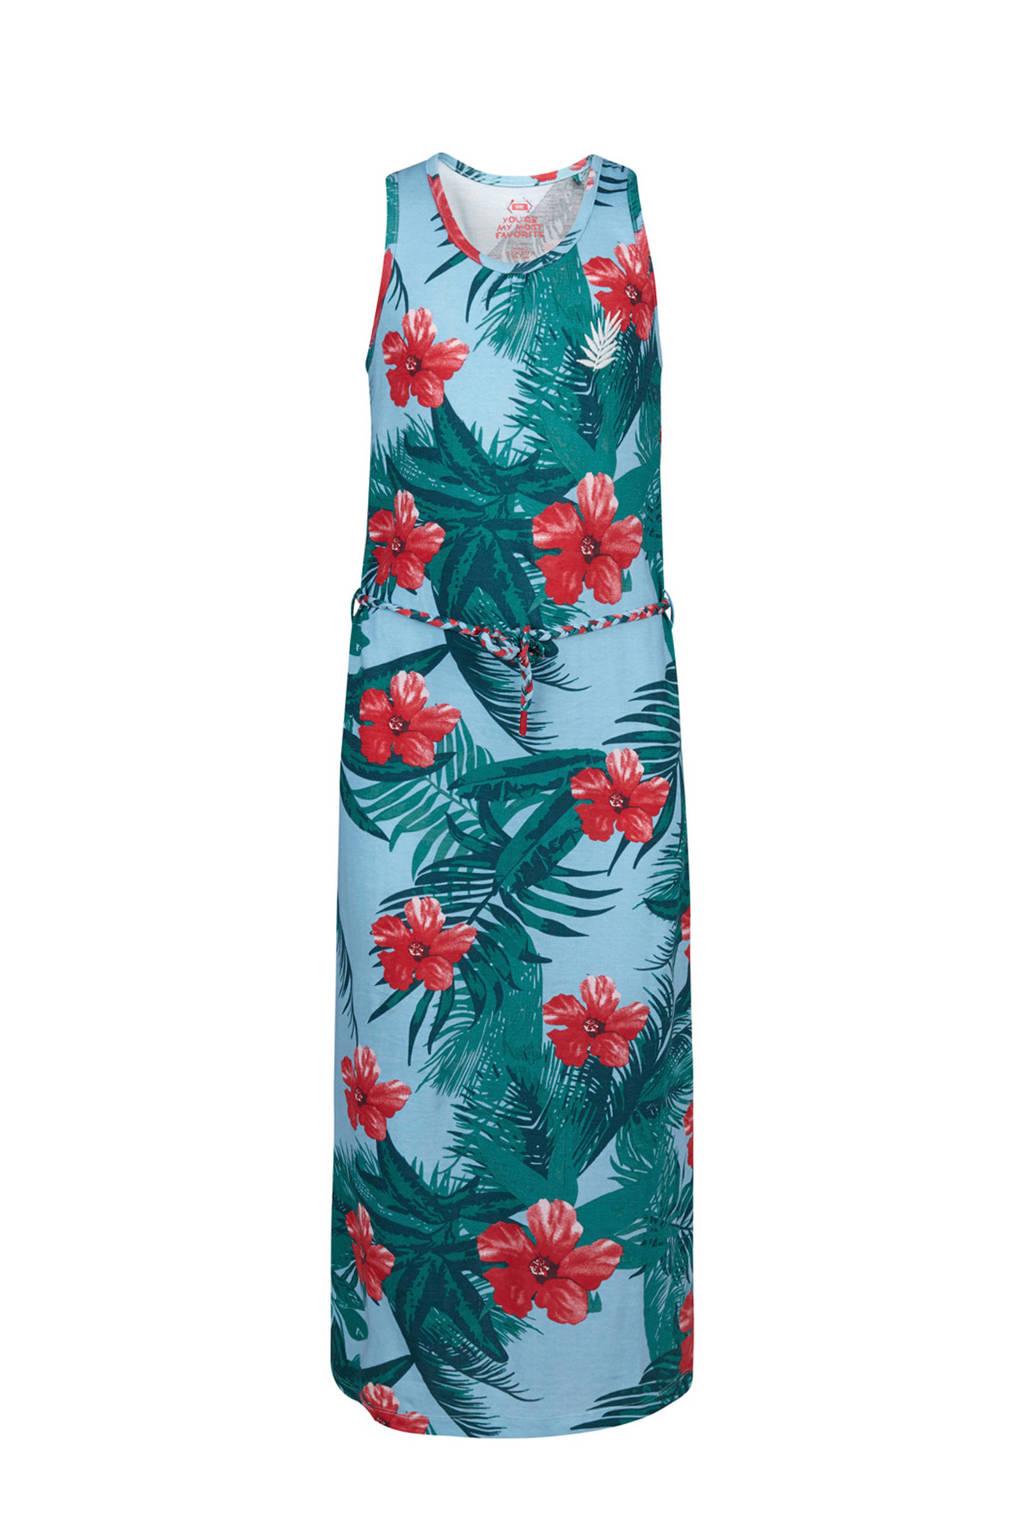 WE Fashion maxi jurk met bloemen dessin blauw, Blauw/groen/rood